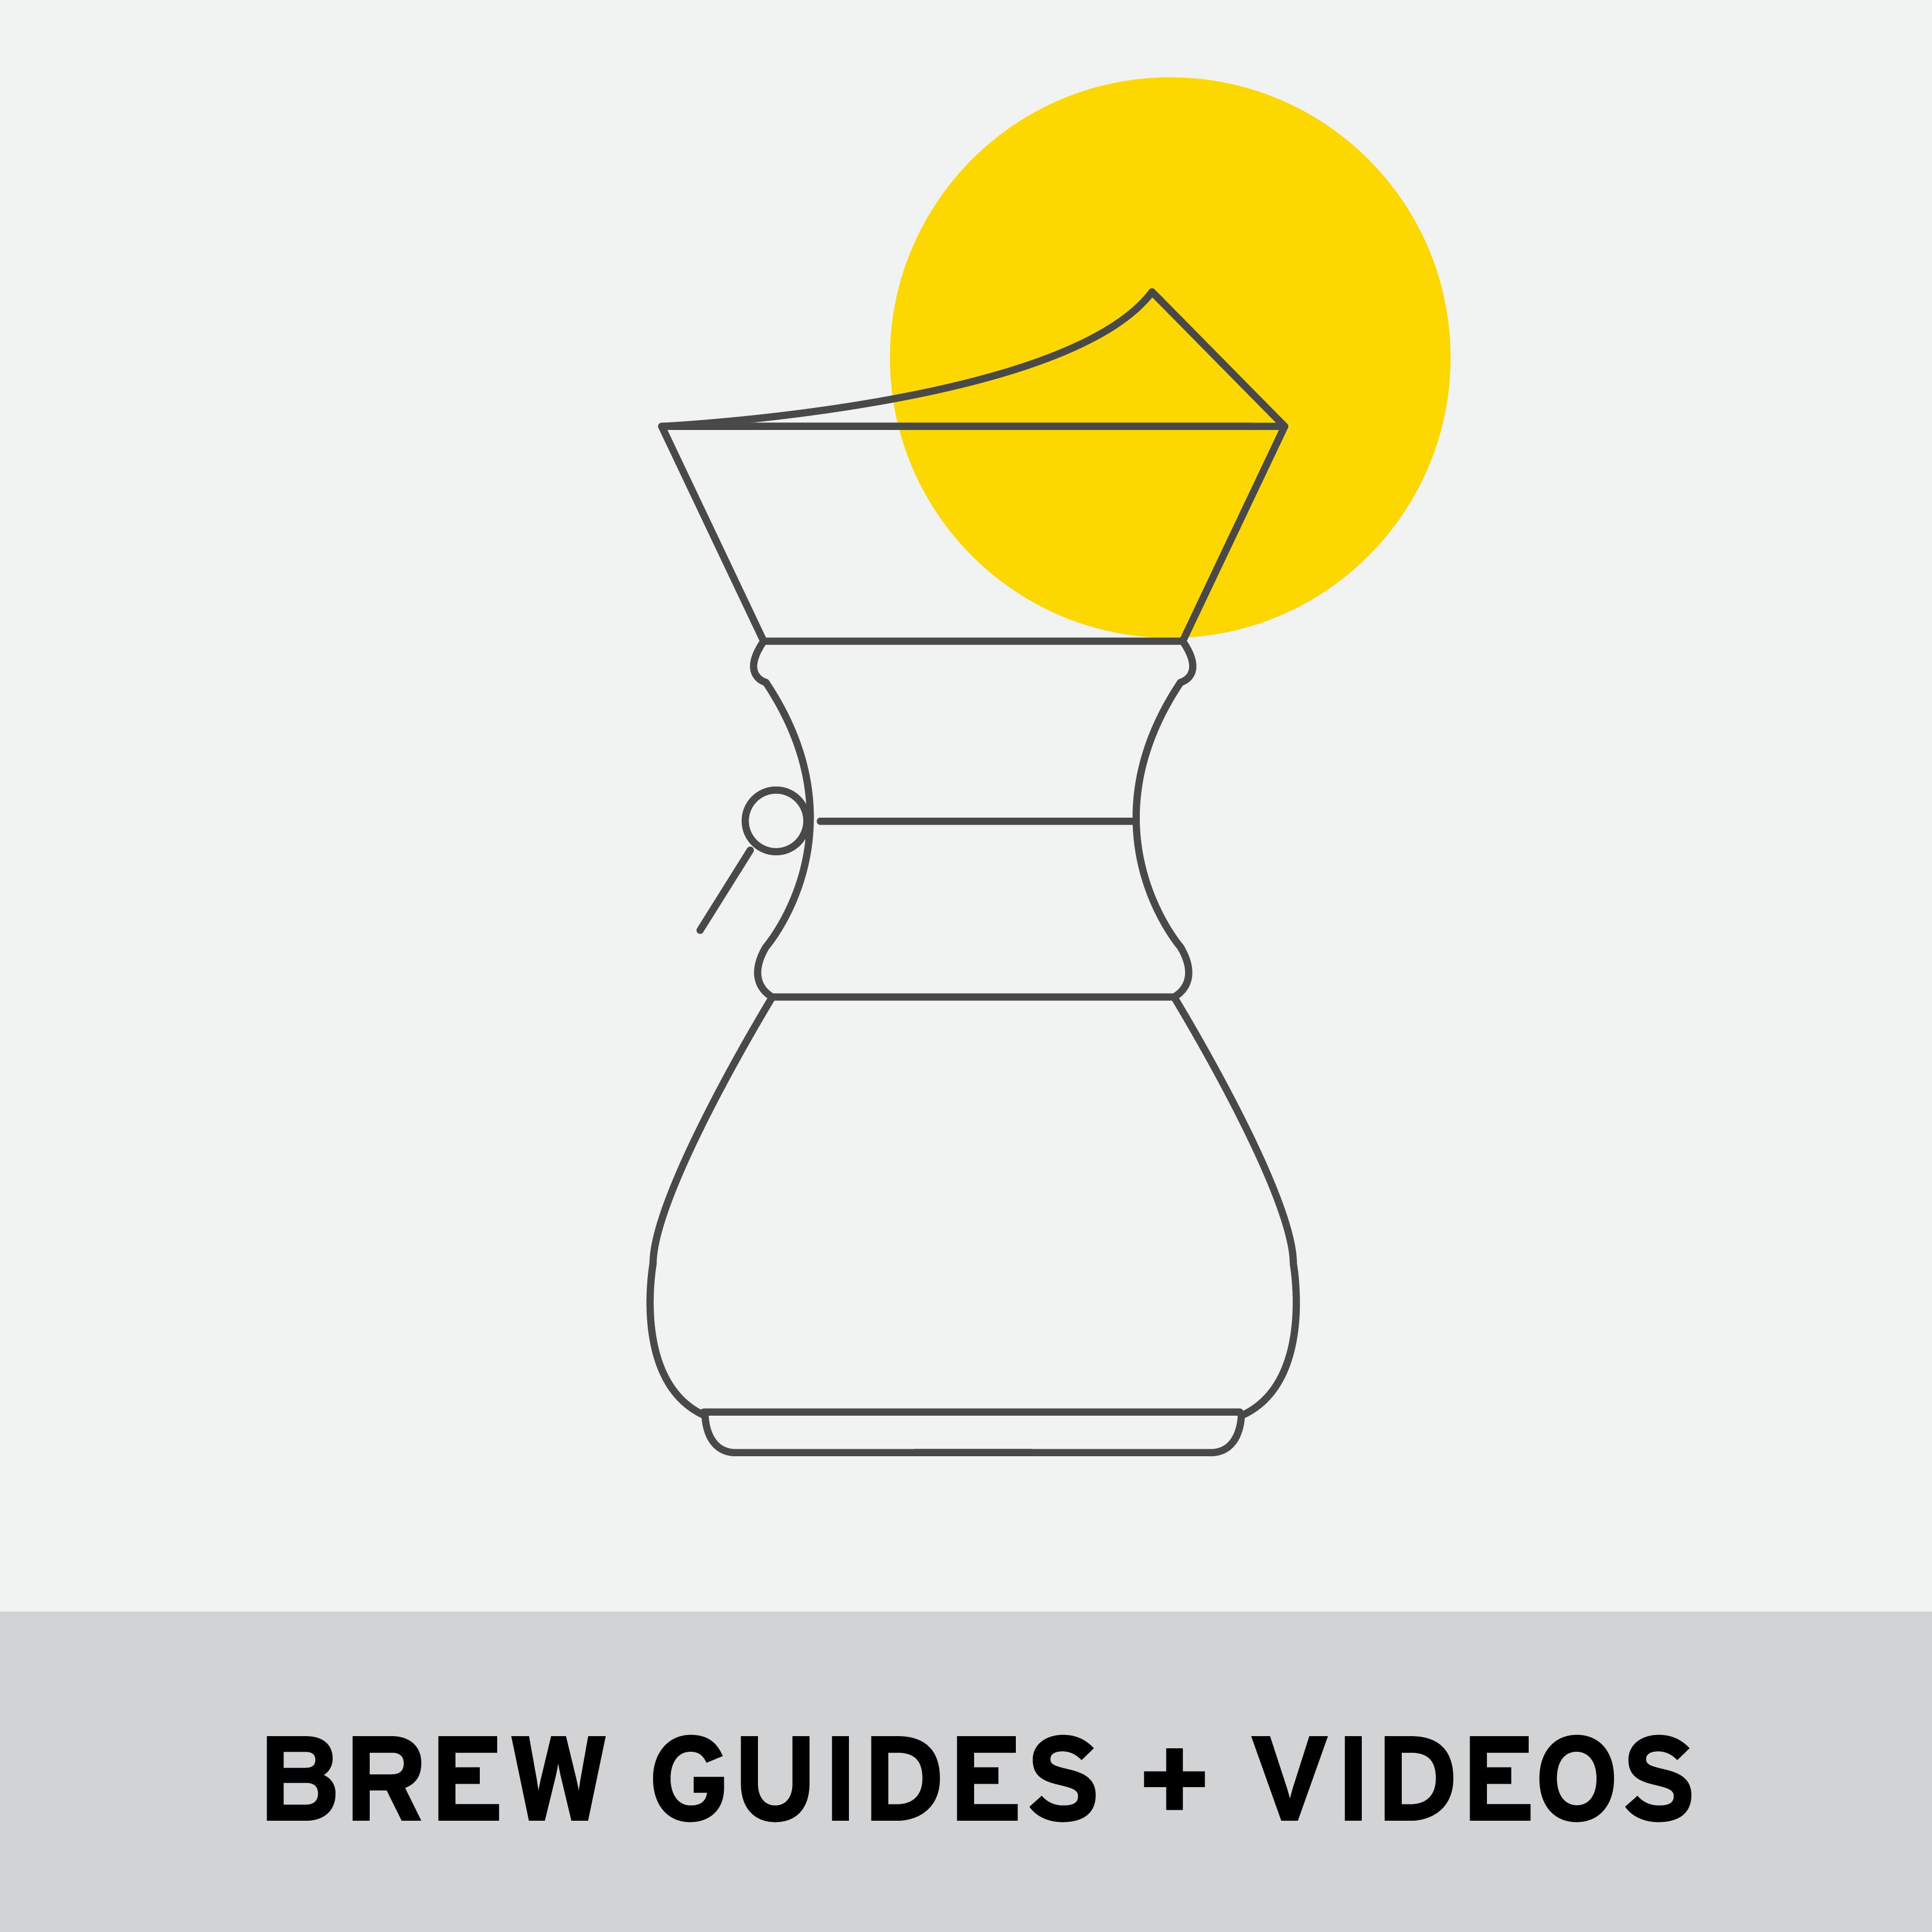 BREW GUIDES + VIDEOS